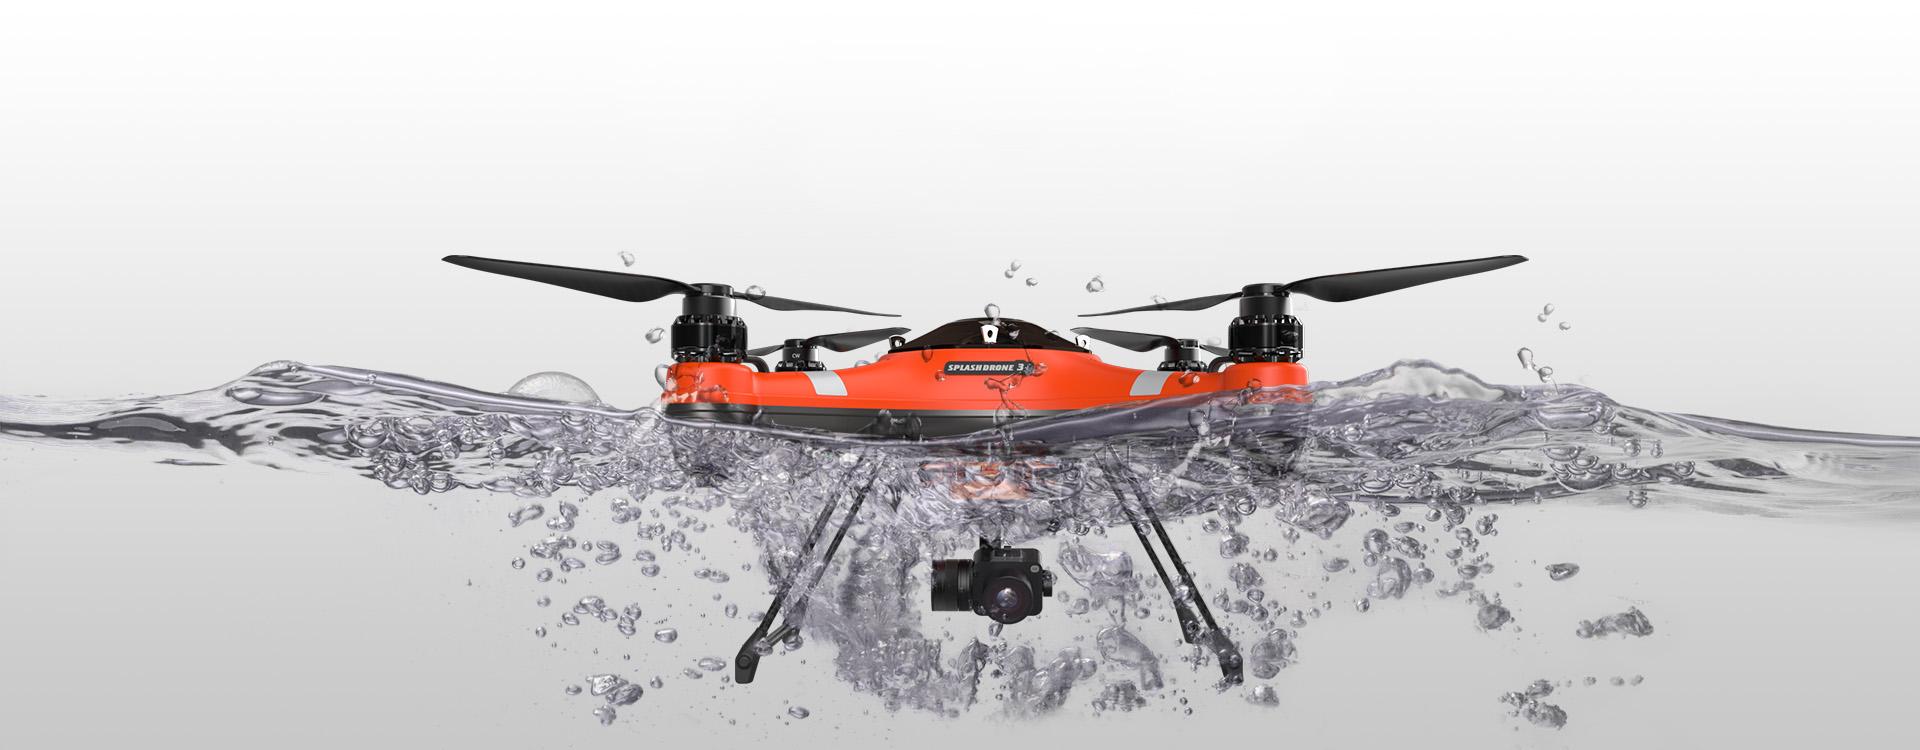 Dron na każde warunki